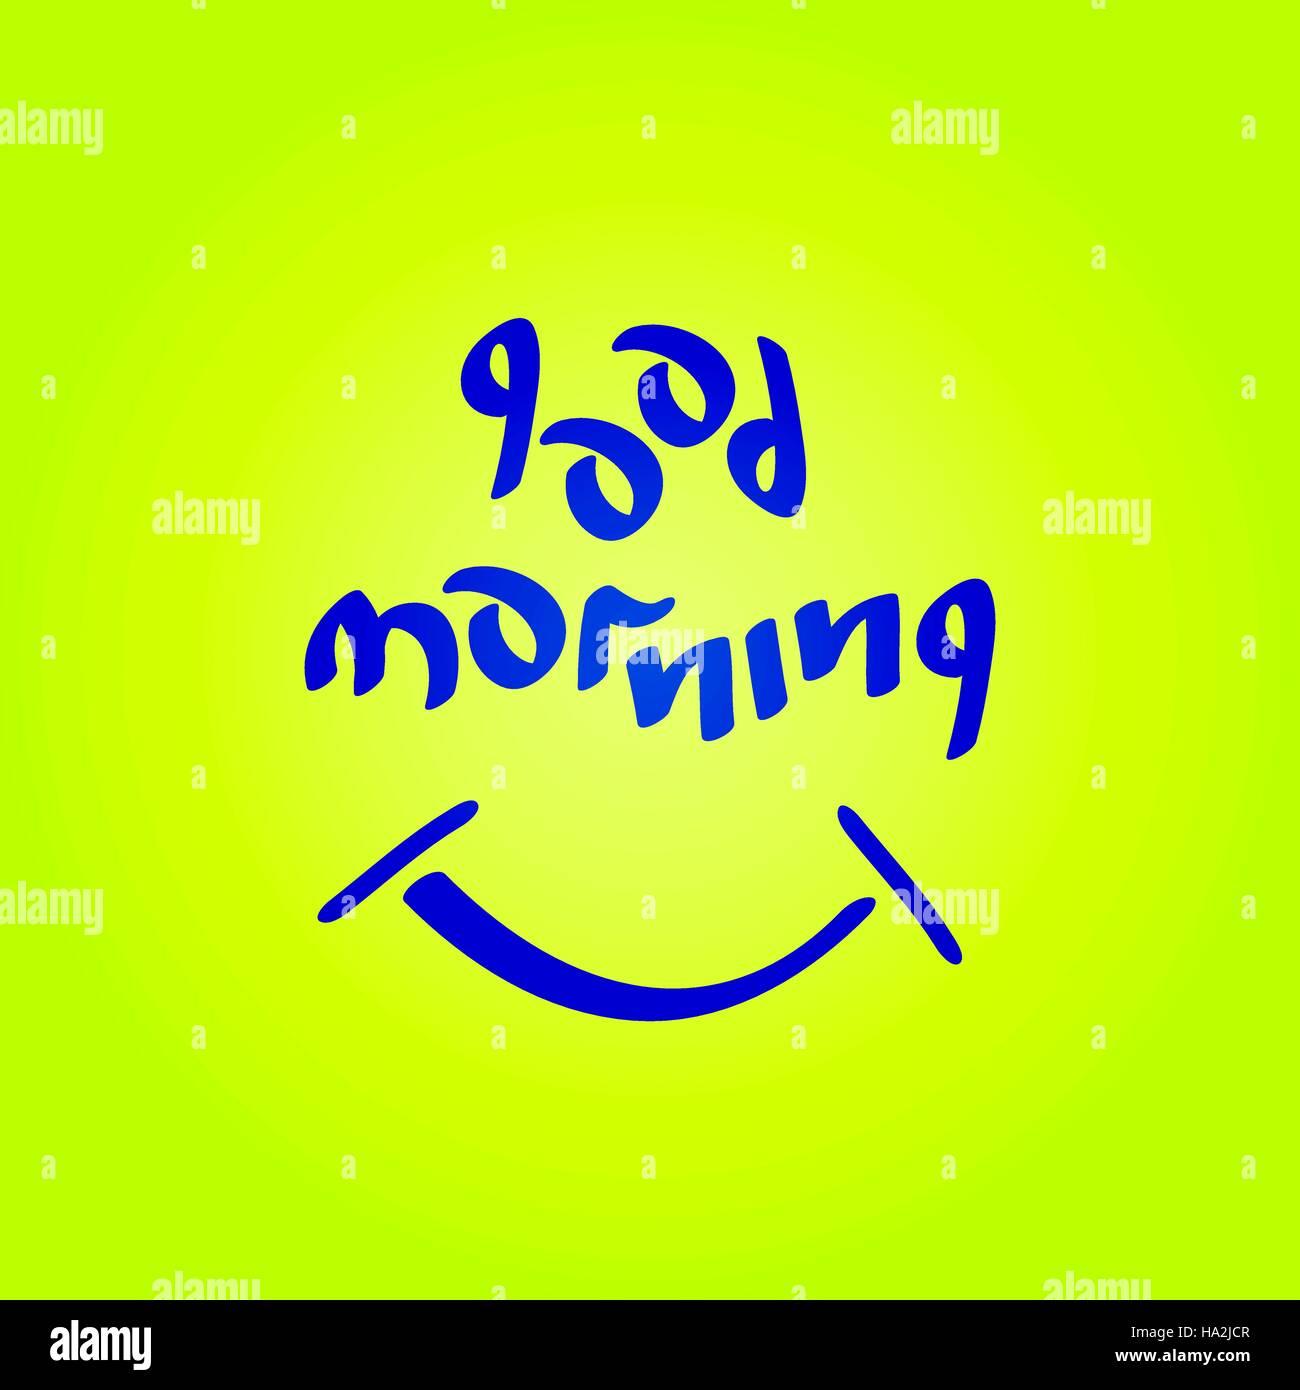 Buenos días texto con símbolo sonriente divertido buen humor ilustración vectorial. Imagen De Stock